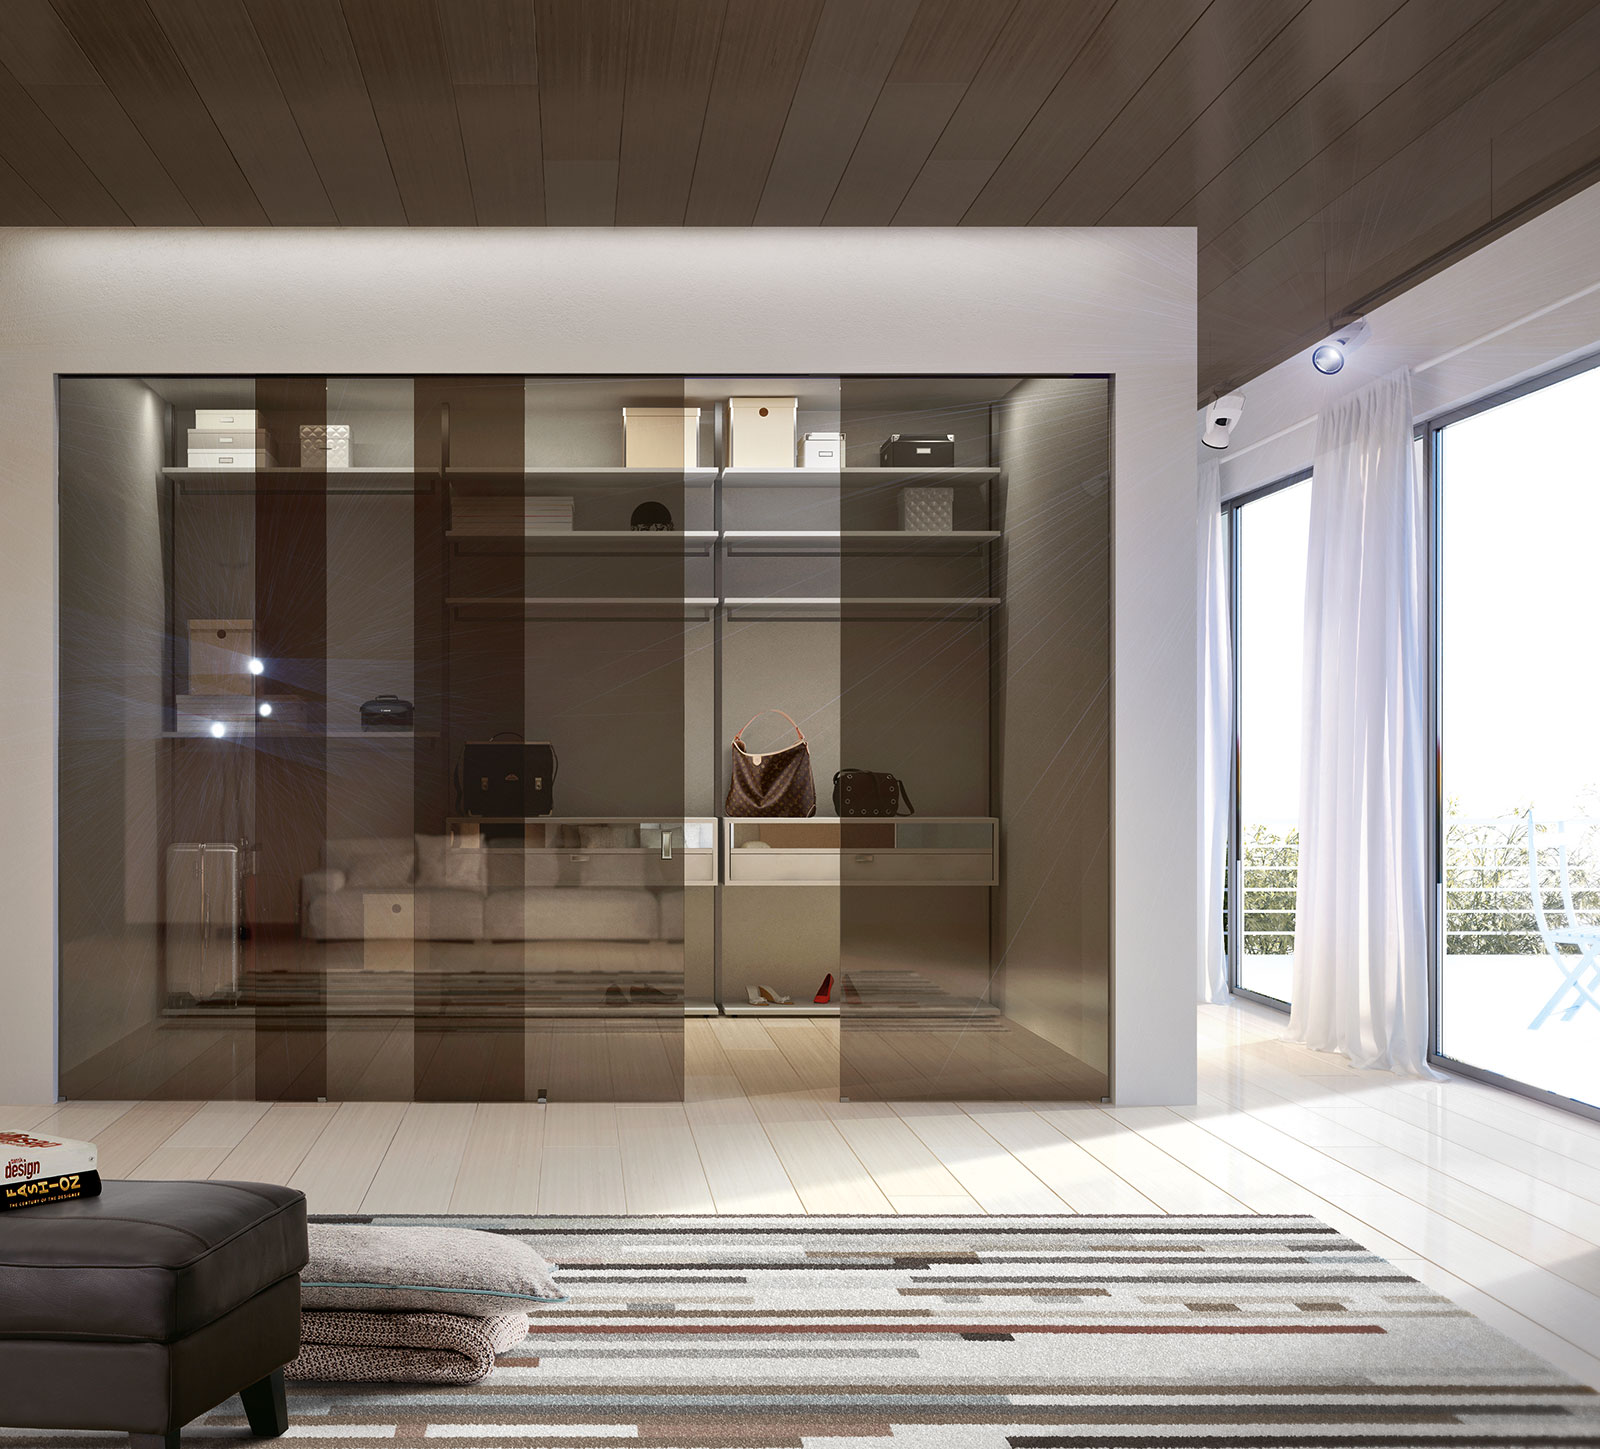 cabina armadio | henry glass - Armadio Tradizionale Montato